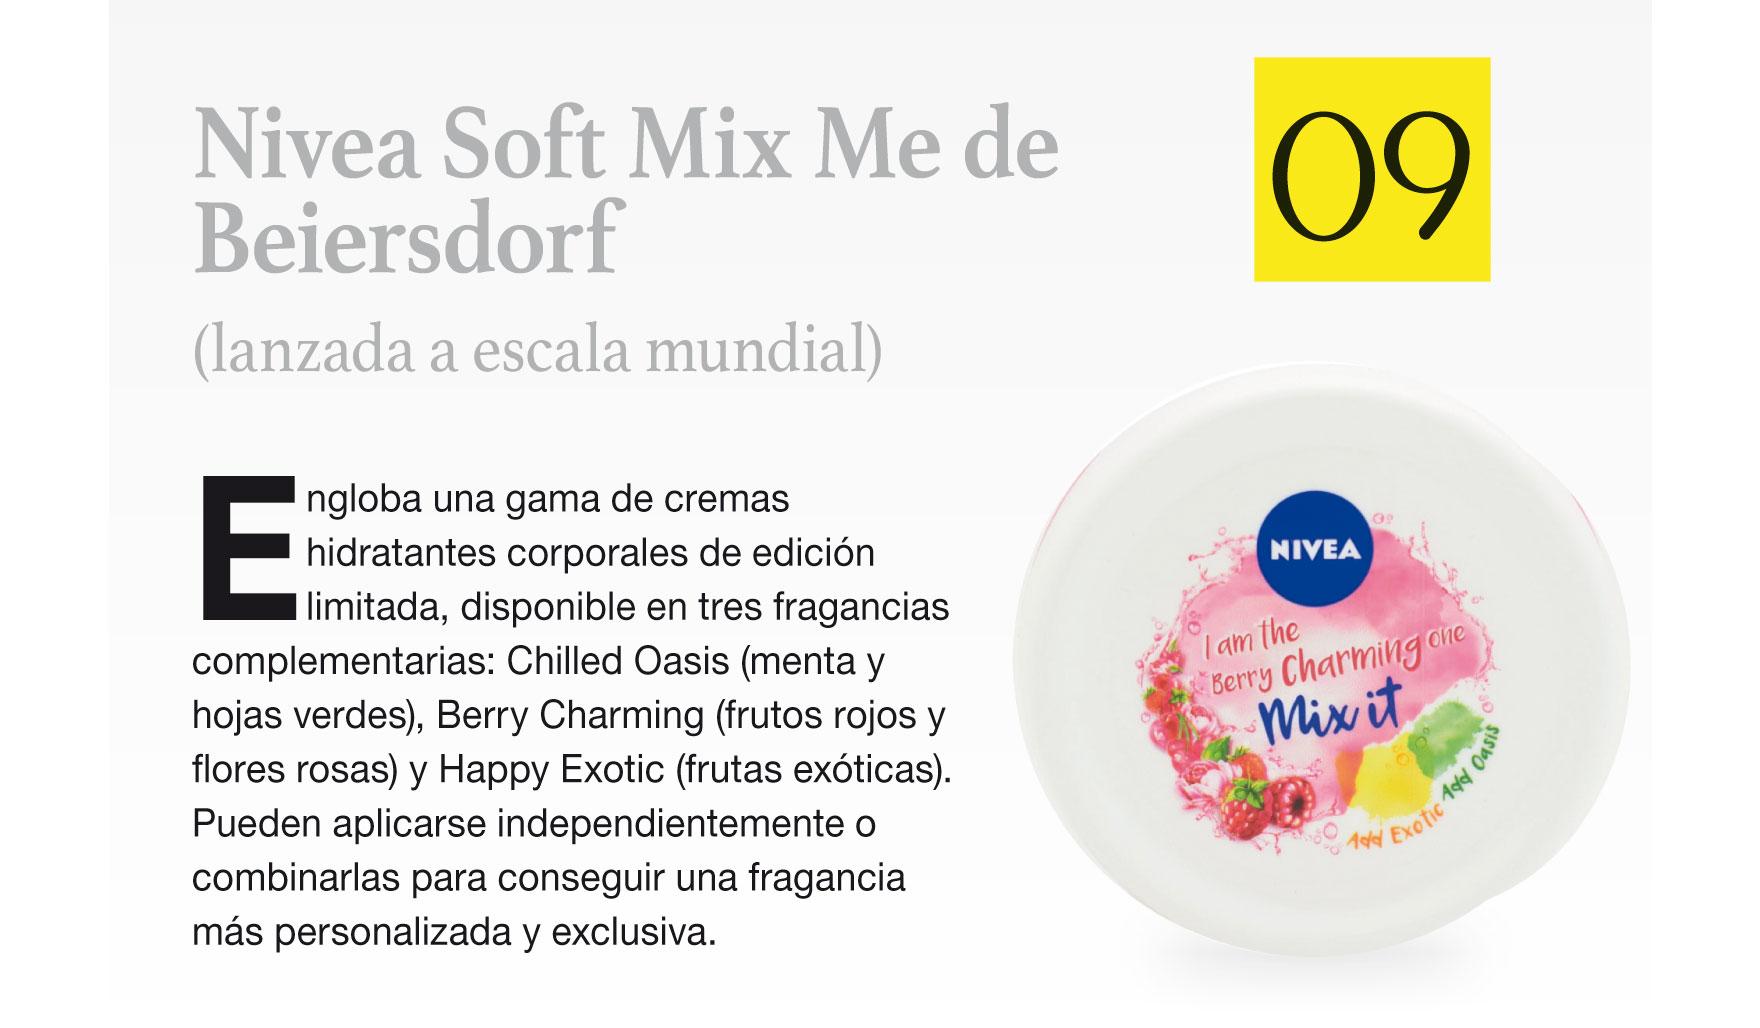 Nivea Soft Mix Me de Beiersdorf (lanzada a escala mundial)